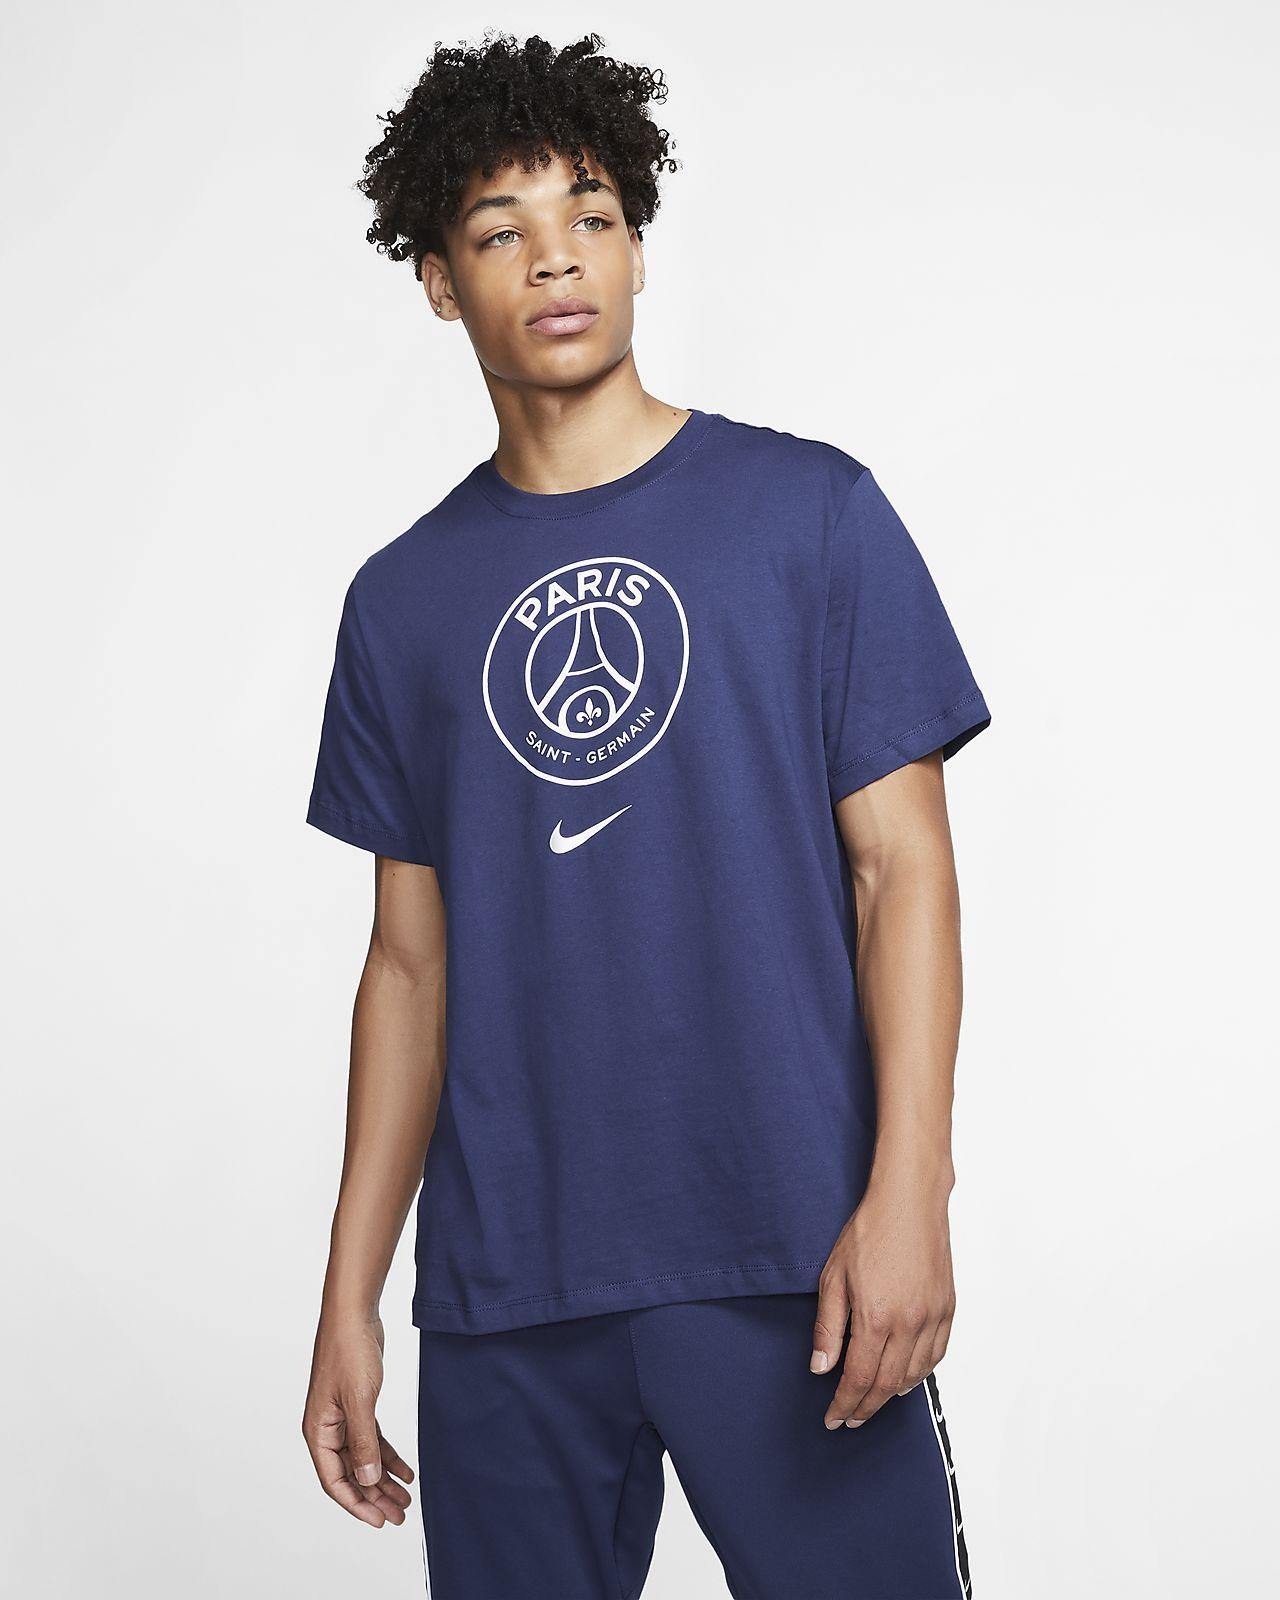 Paris Saint-Germain Men's T-Shirt